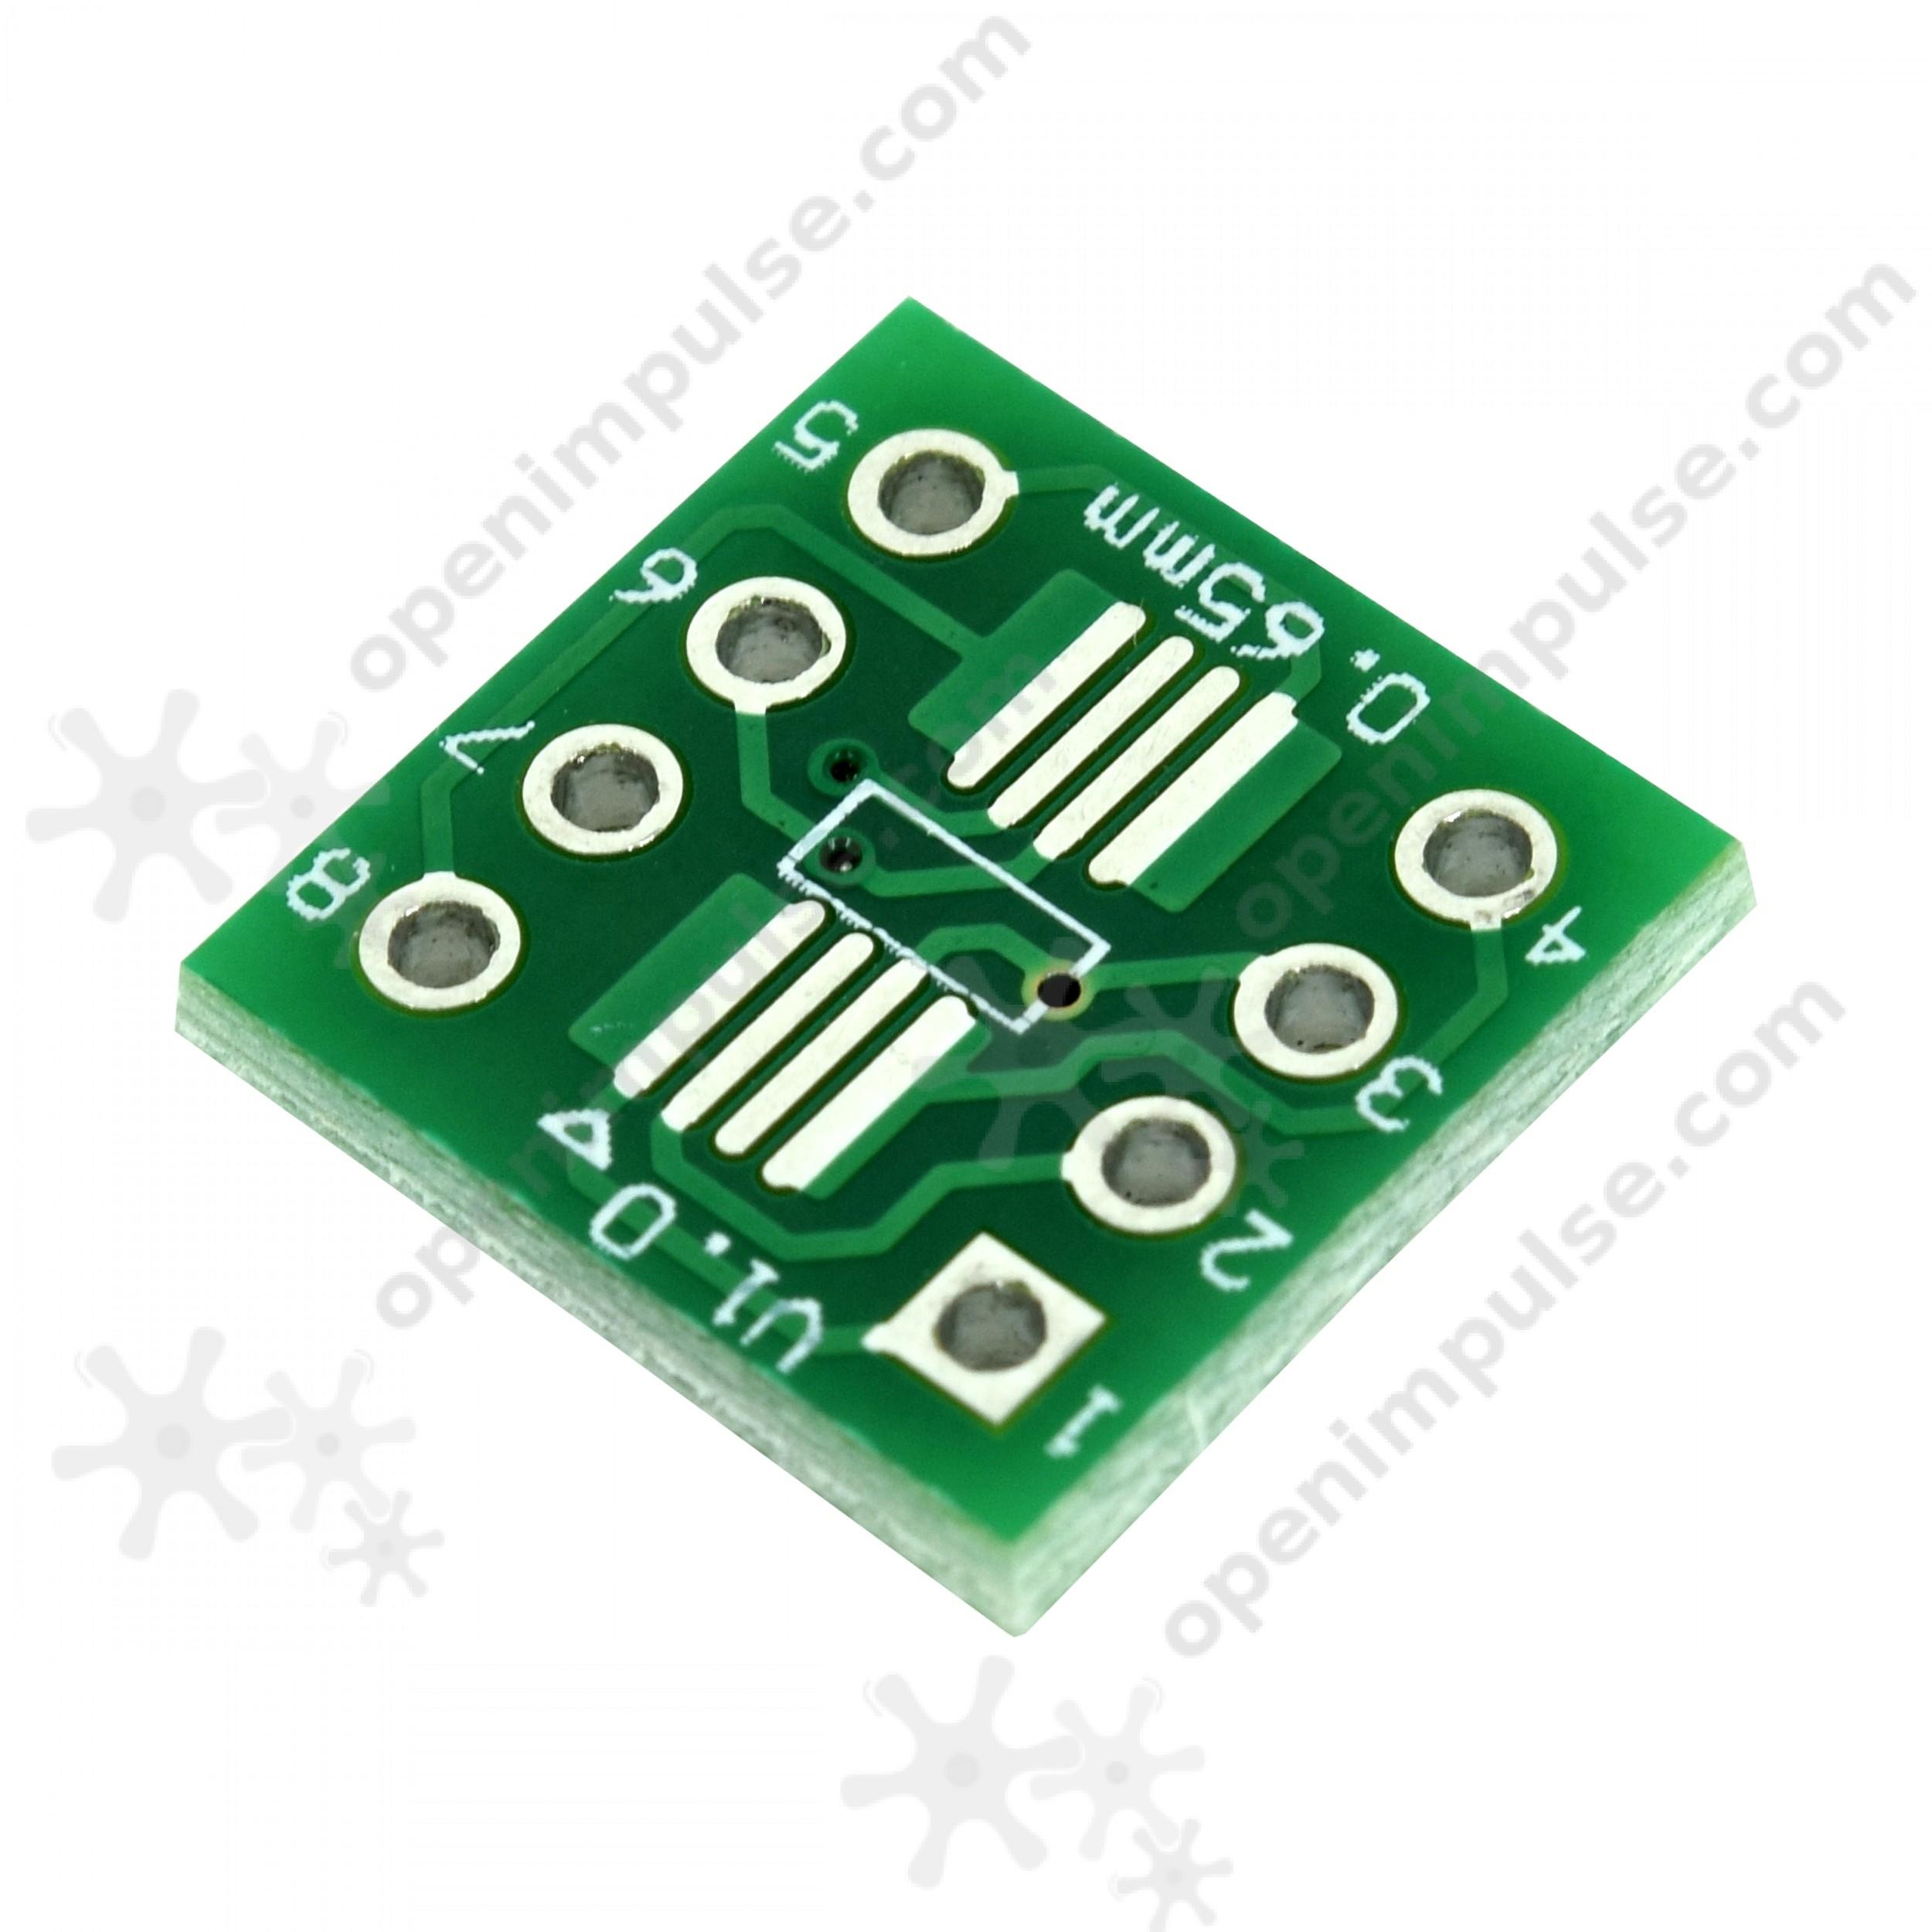 20pcs SOP8SSOP8 SMD to DIP Adapter  Open ImpulseOpen Impulse